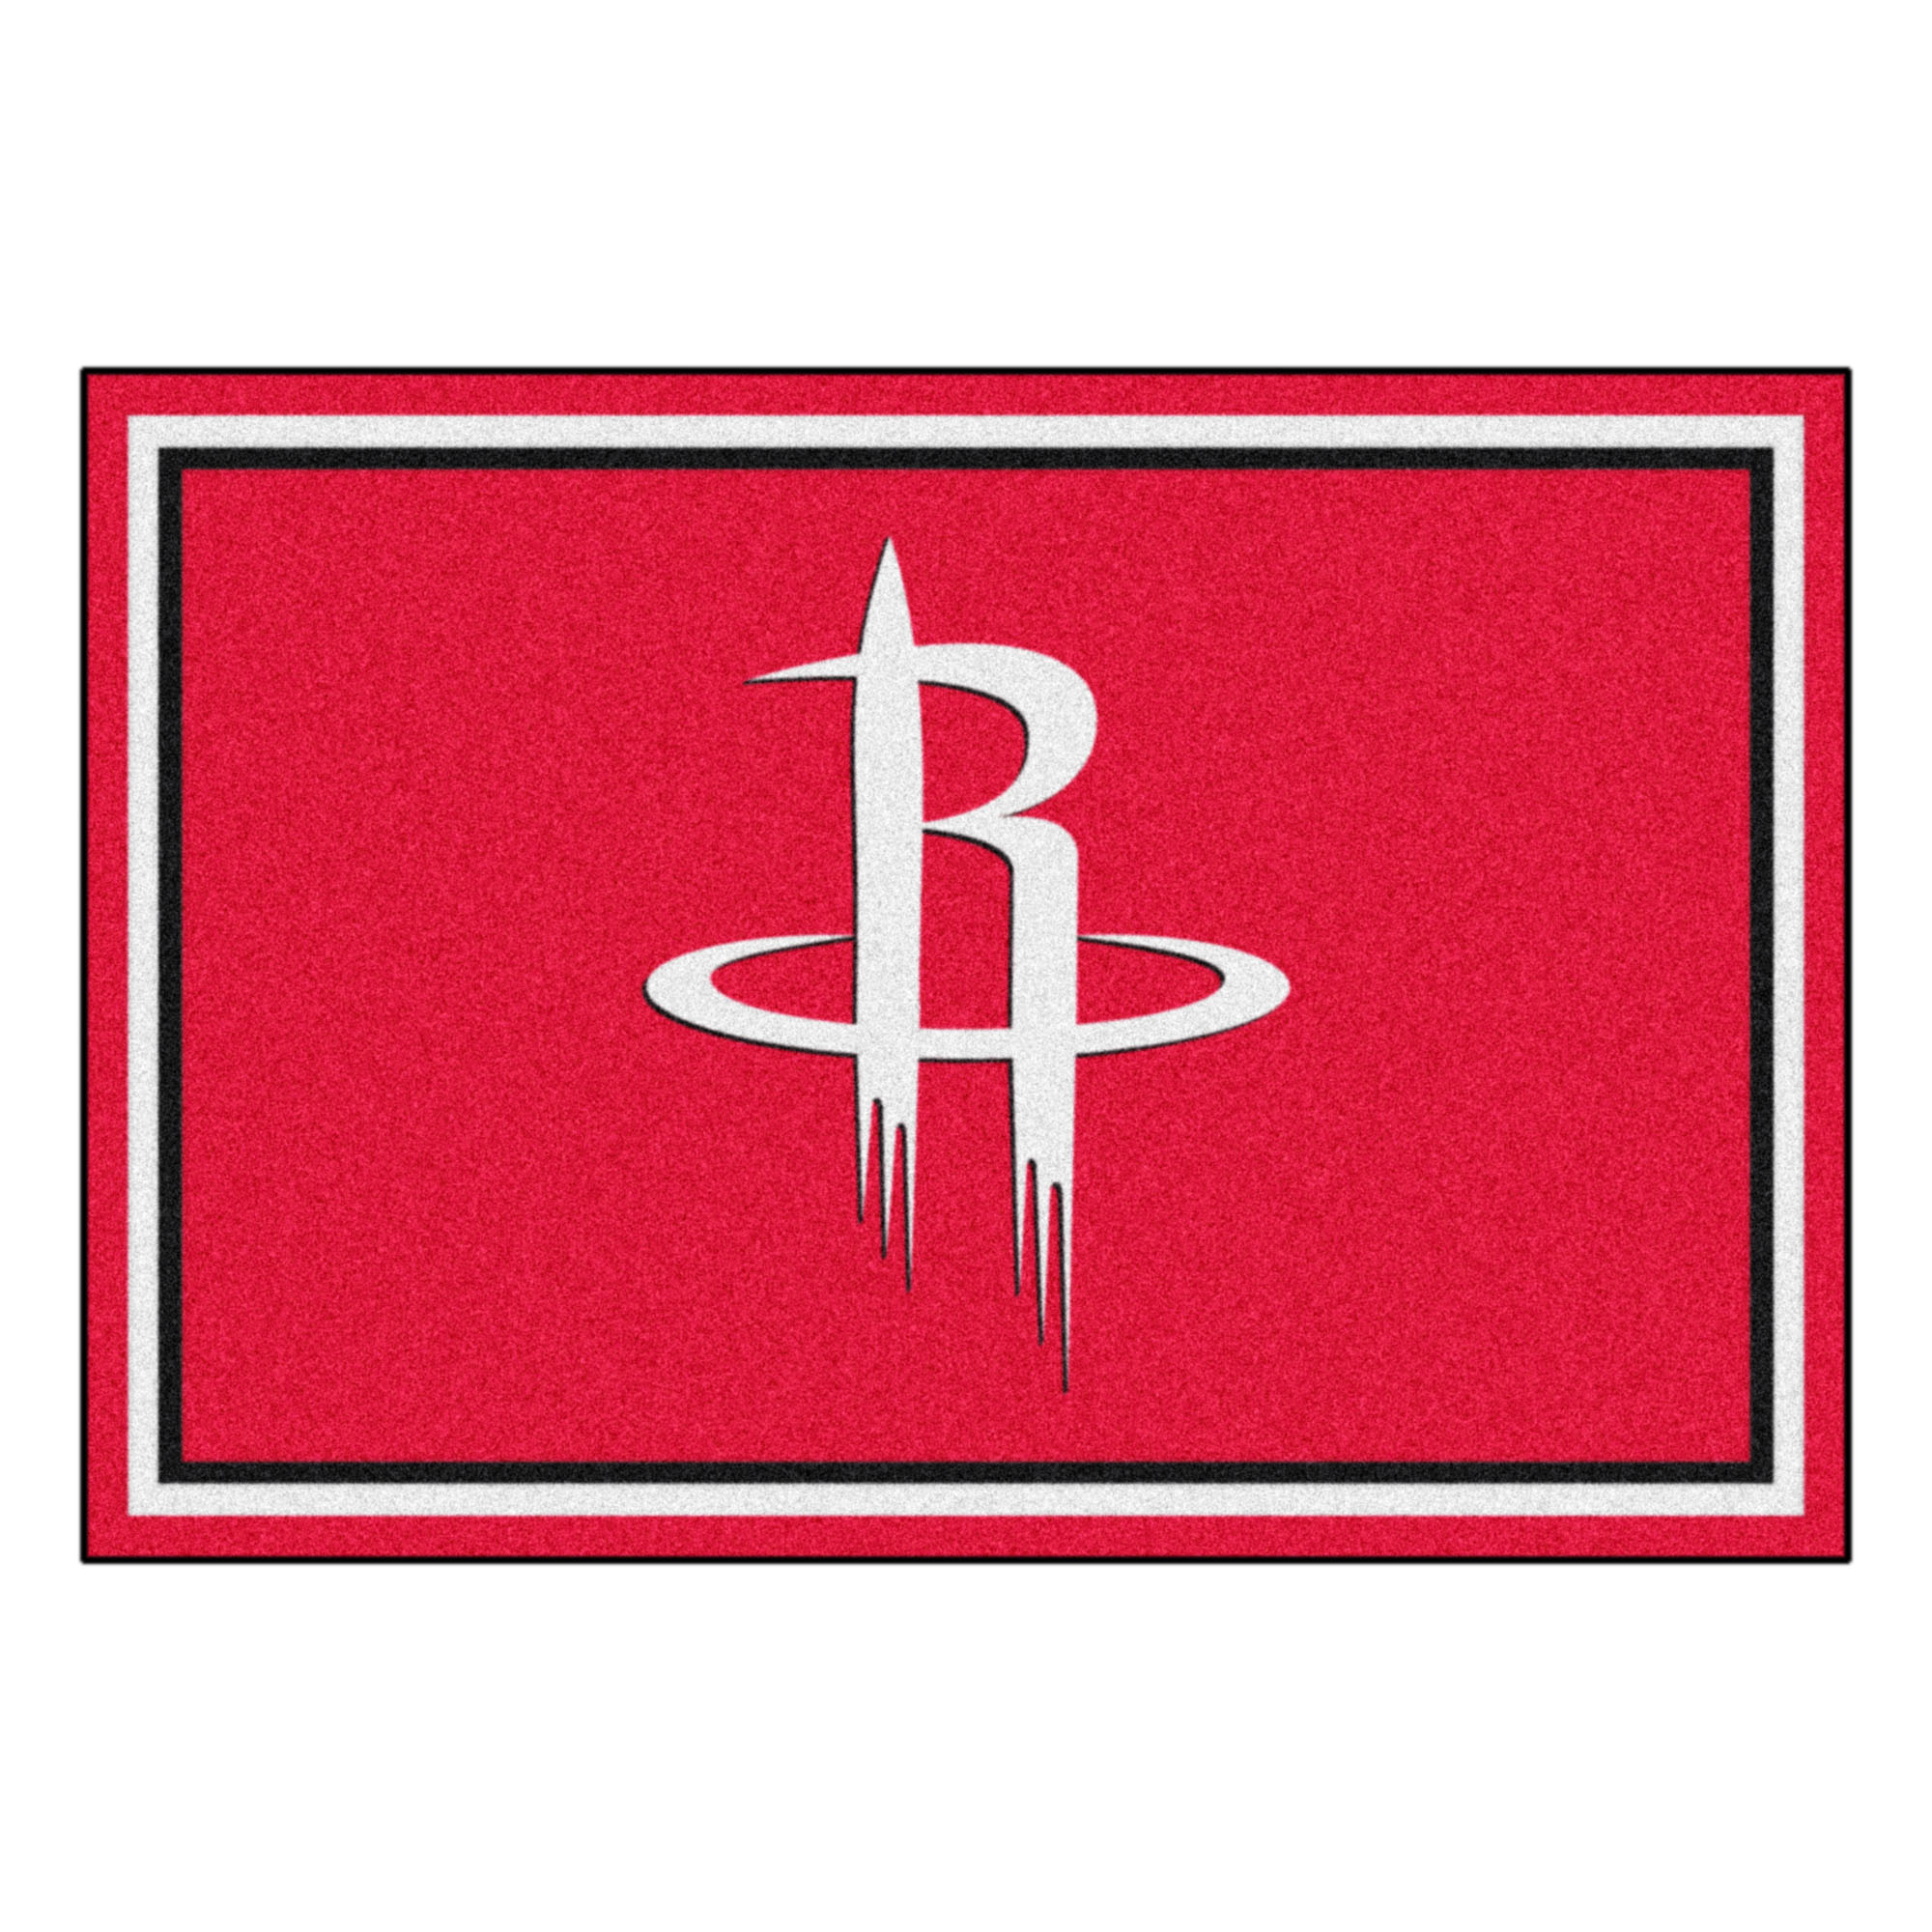 NBA Houston Rockets 5 x 8 Foot Plush Non-Skid Area Rug